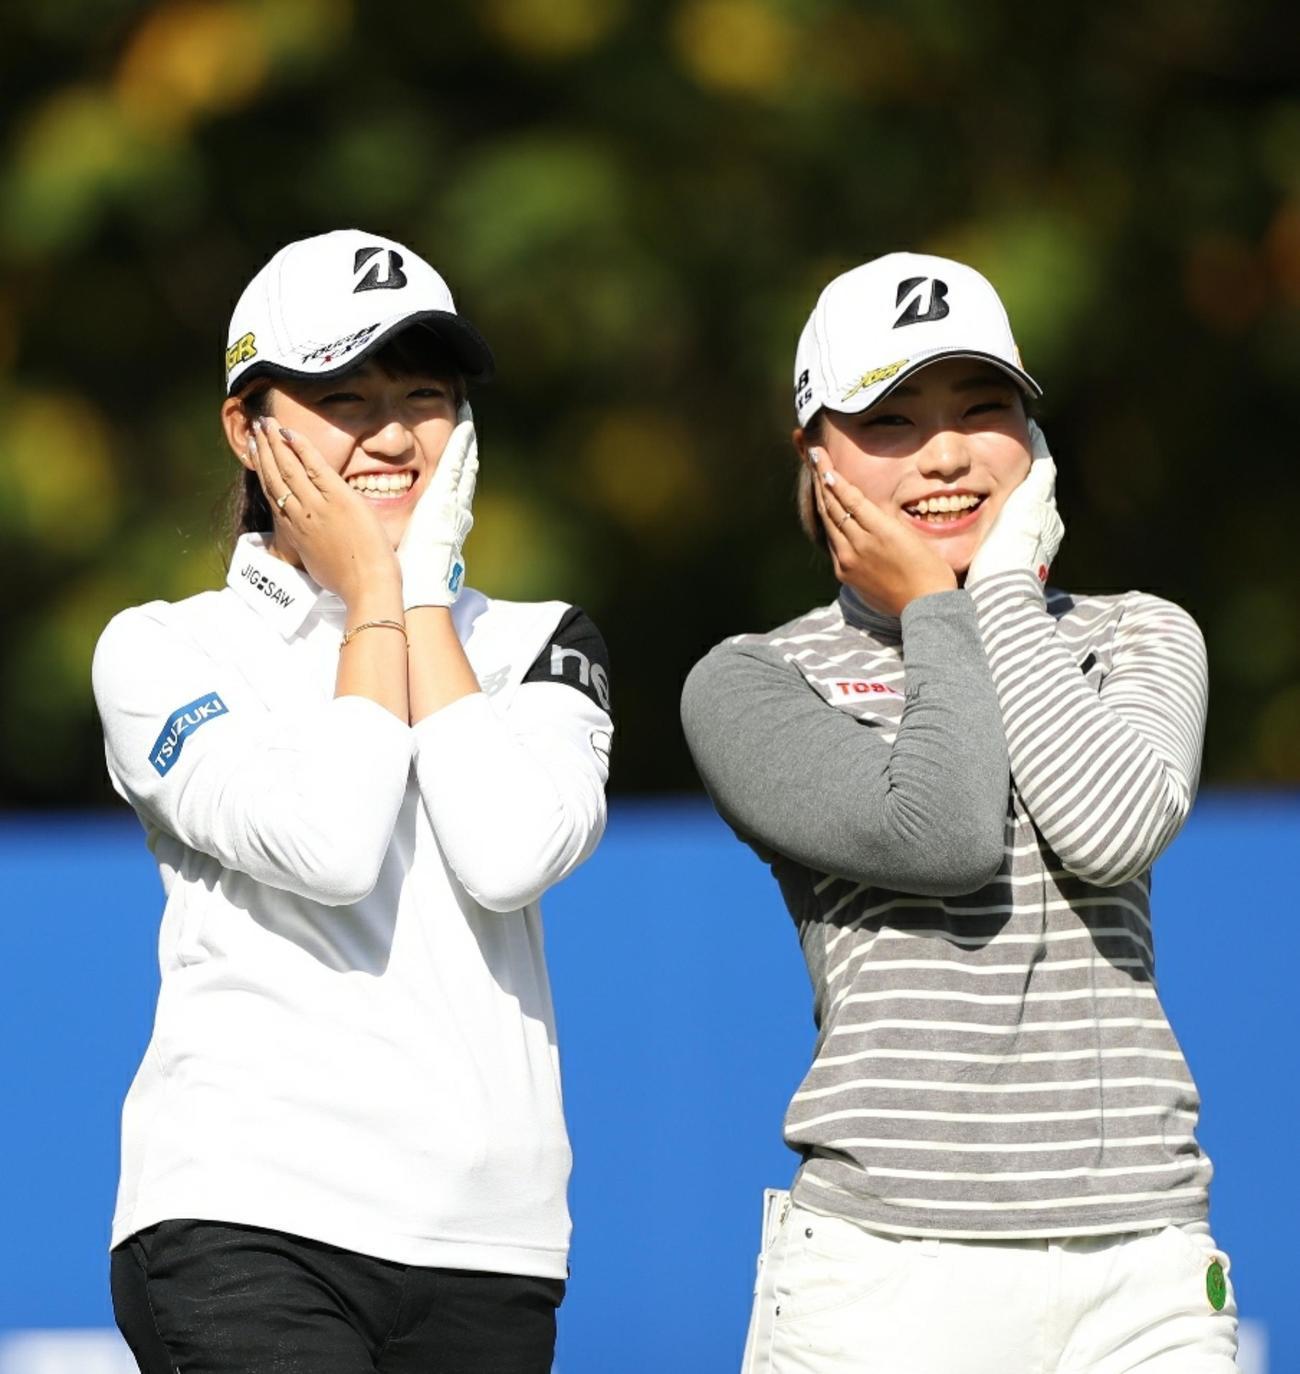 https://www.nikkansports.com/sports/golf/news/img/202011050000106-w1300_10.jpg